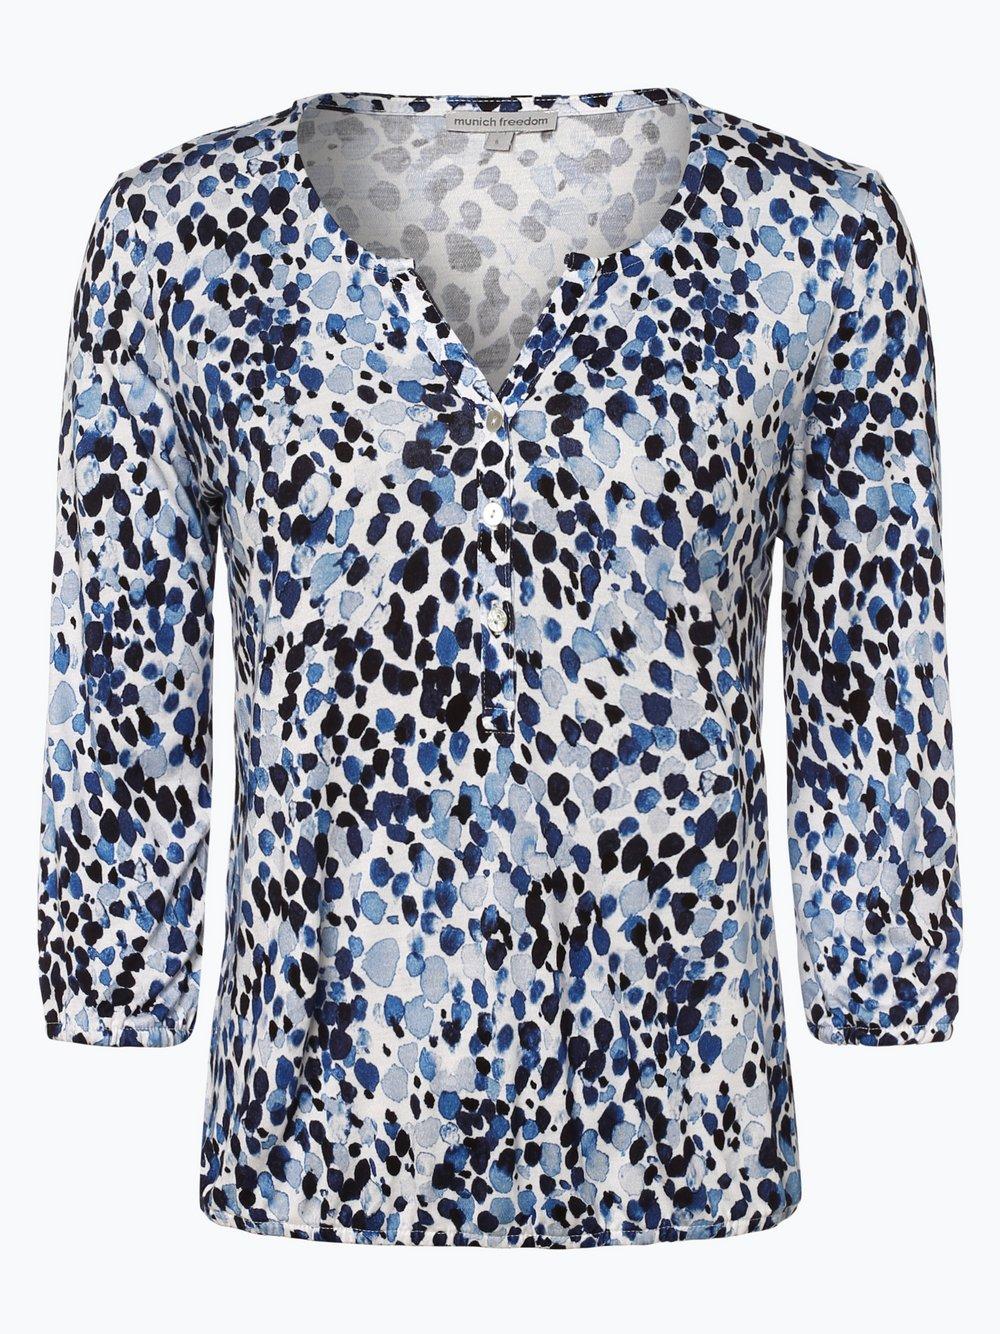 Munich Freedom – Koszulka damska, niebieski Van Graaf 456147-0002-09940